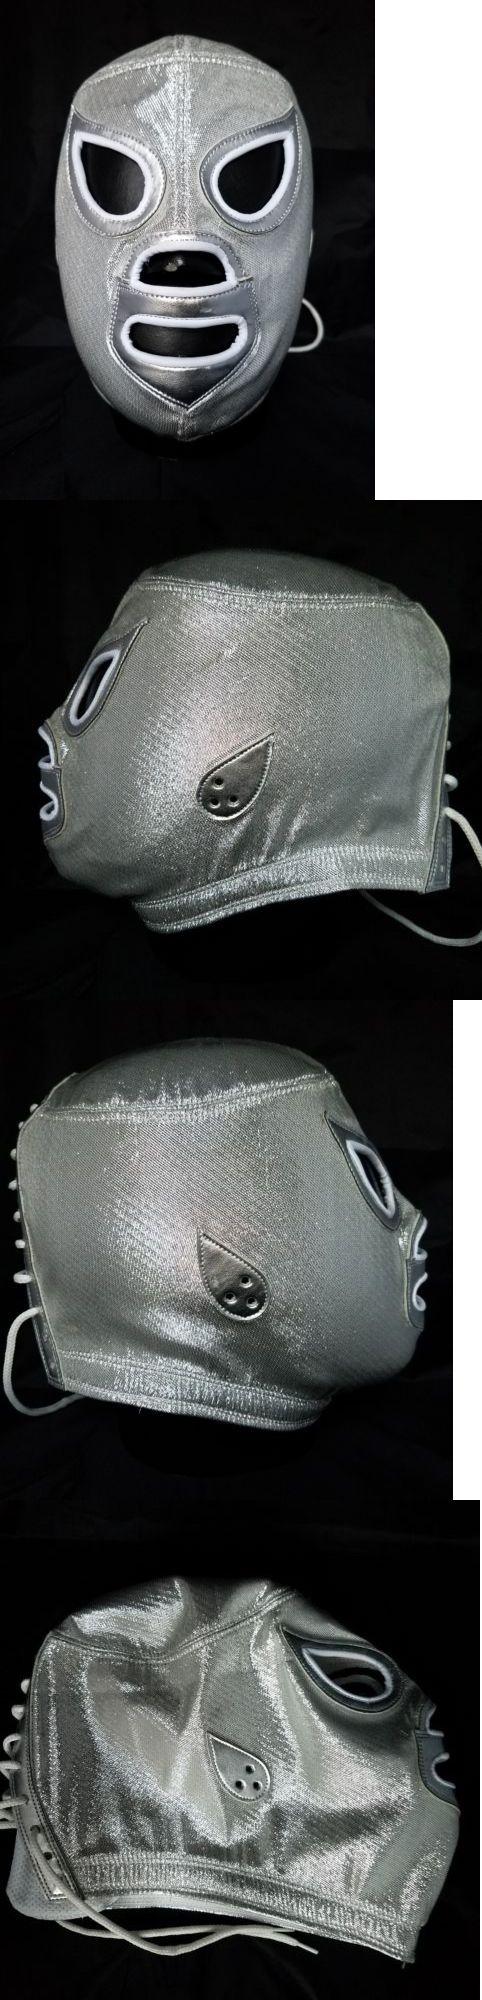 Wrestling 2902: Hijo Del Santo Mask Lucha Underground Aaa Wwe Cmll -> BUY IT NOW ONLY: $150 on eBay!